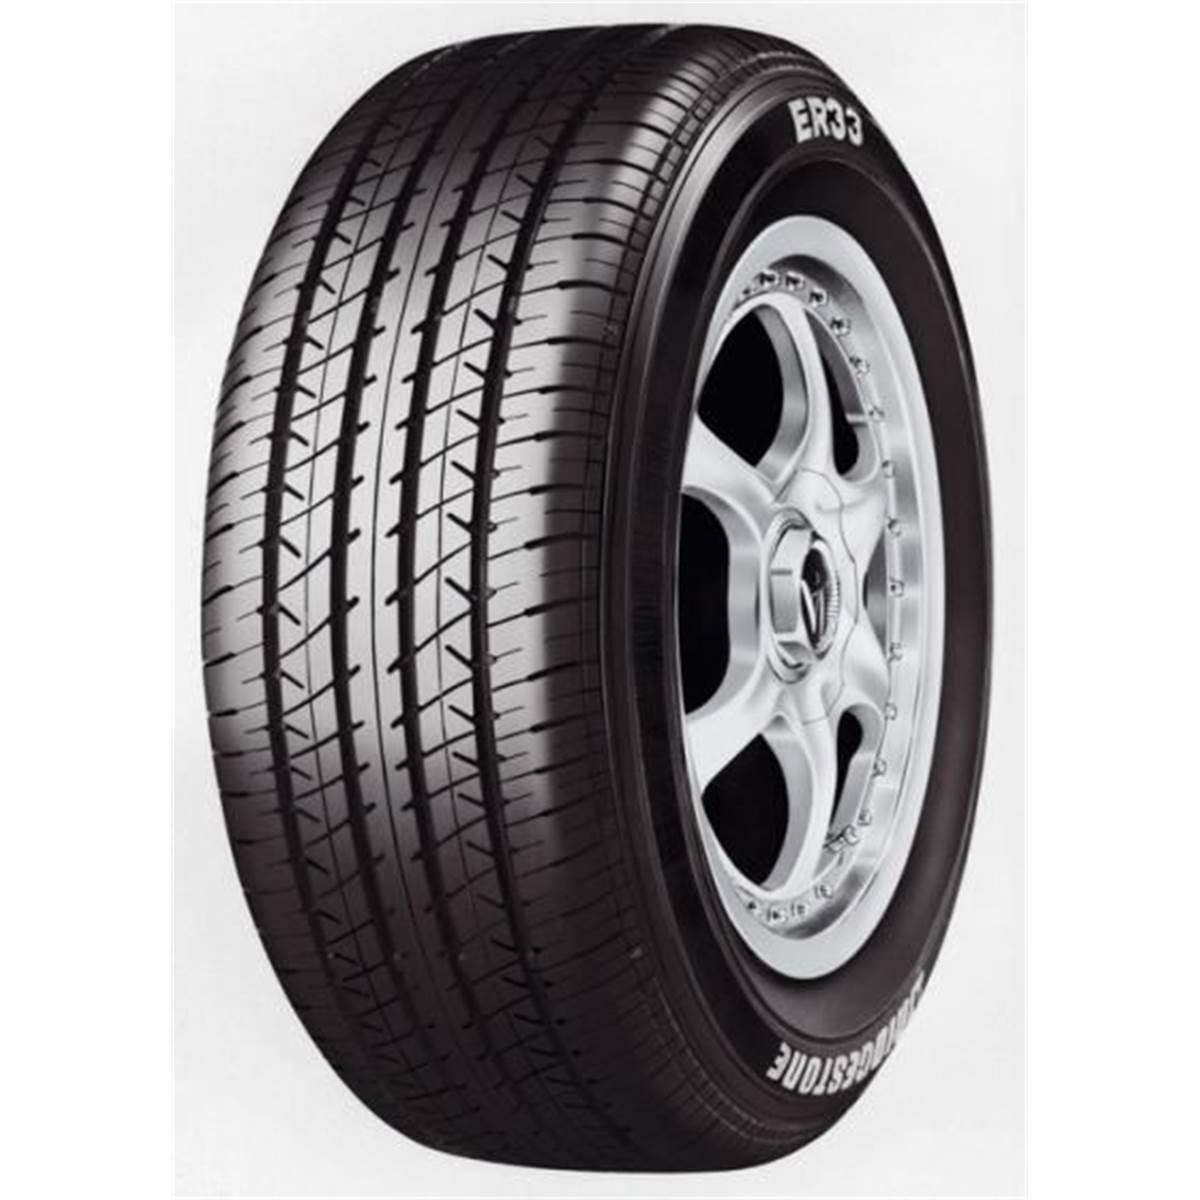 Pneu Bridgestone 255/35R18 90Y TURANZA ER33